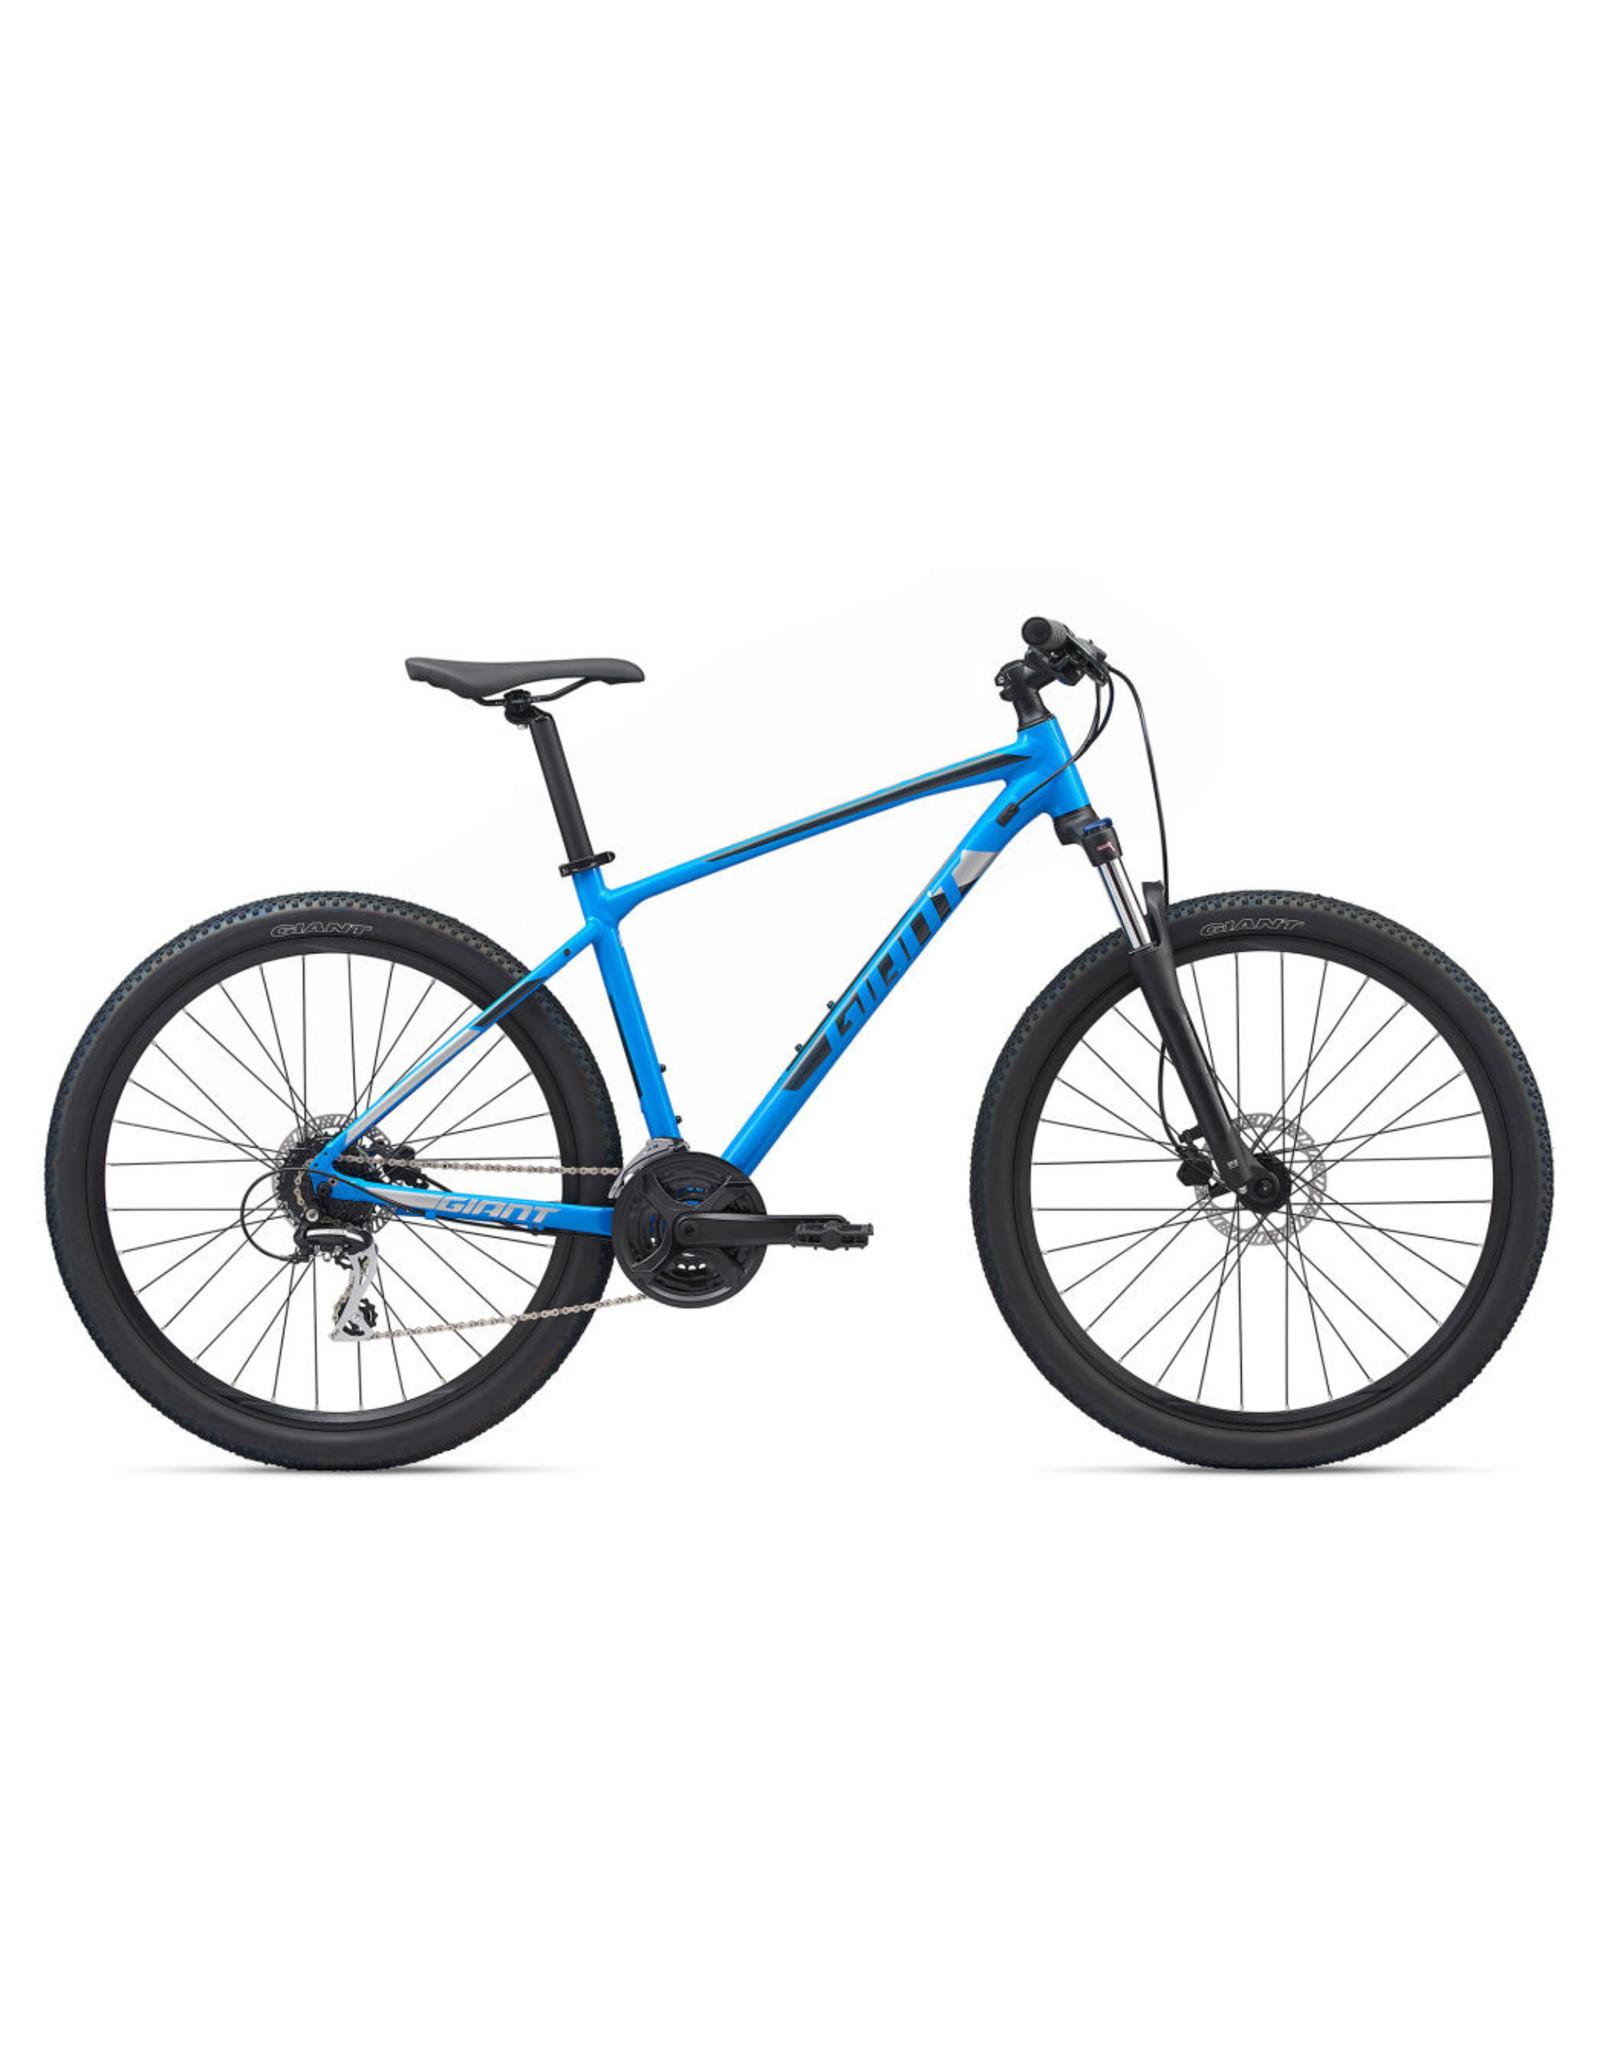 Giant ATX 27.5 S Vibrant Blue